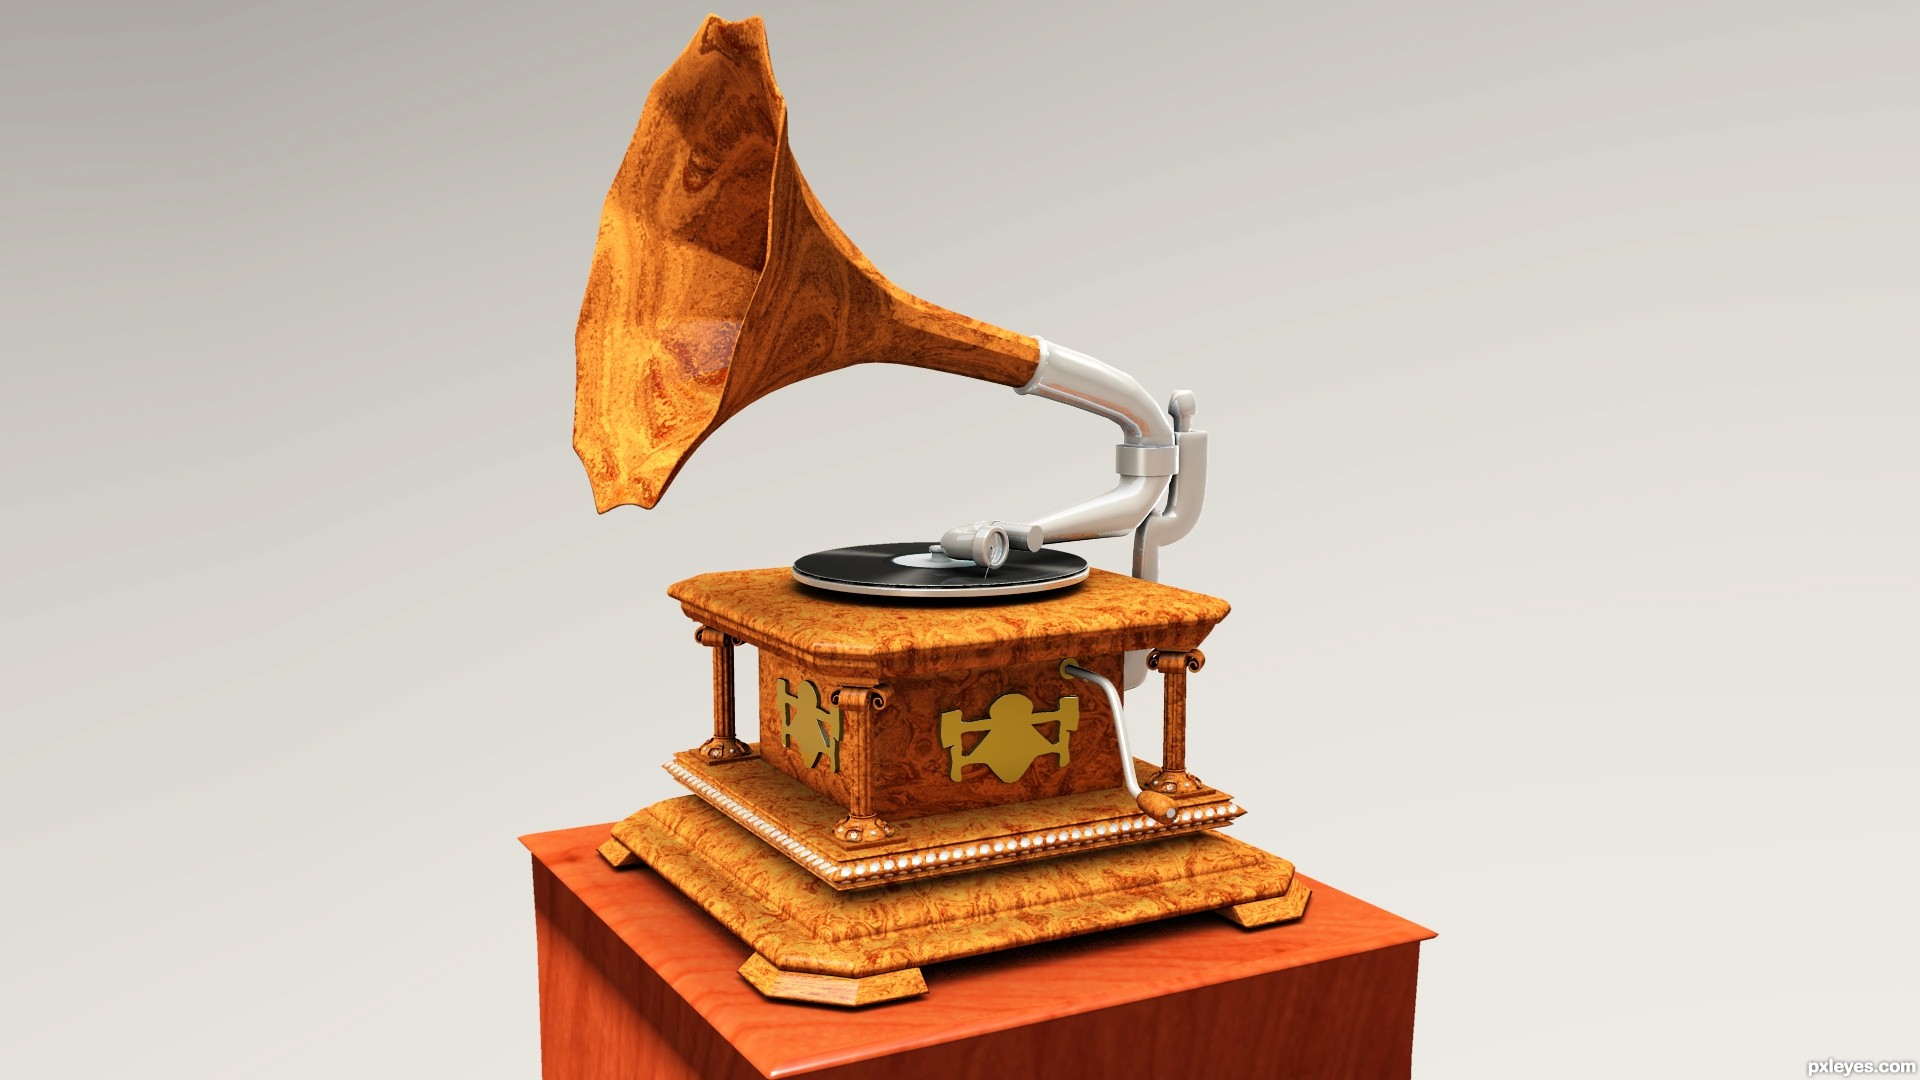 Gramafon Gramophone-De-Luxe-4c9e47fca8af7_hires